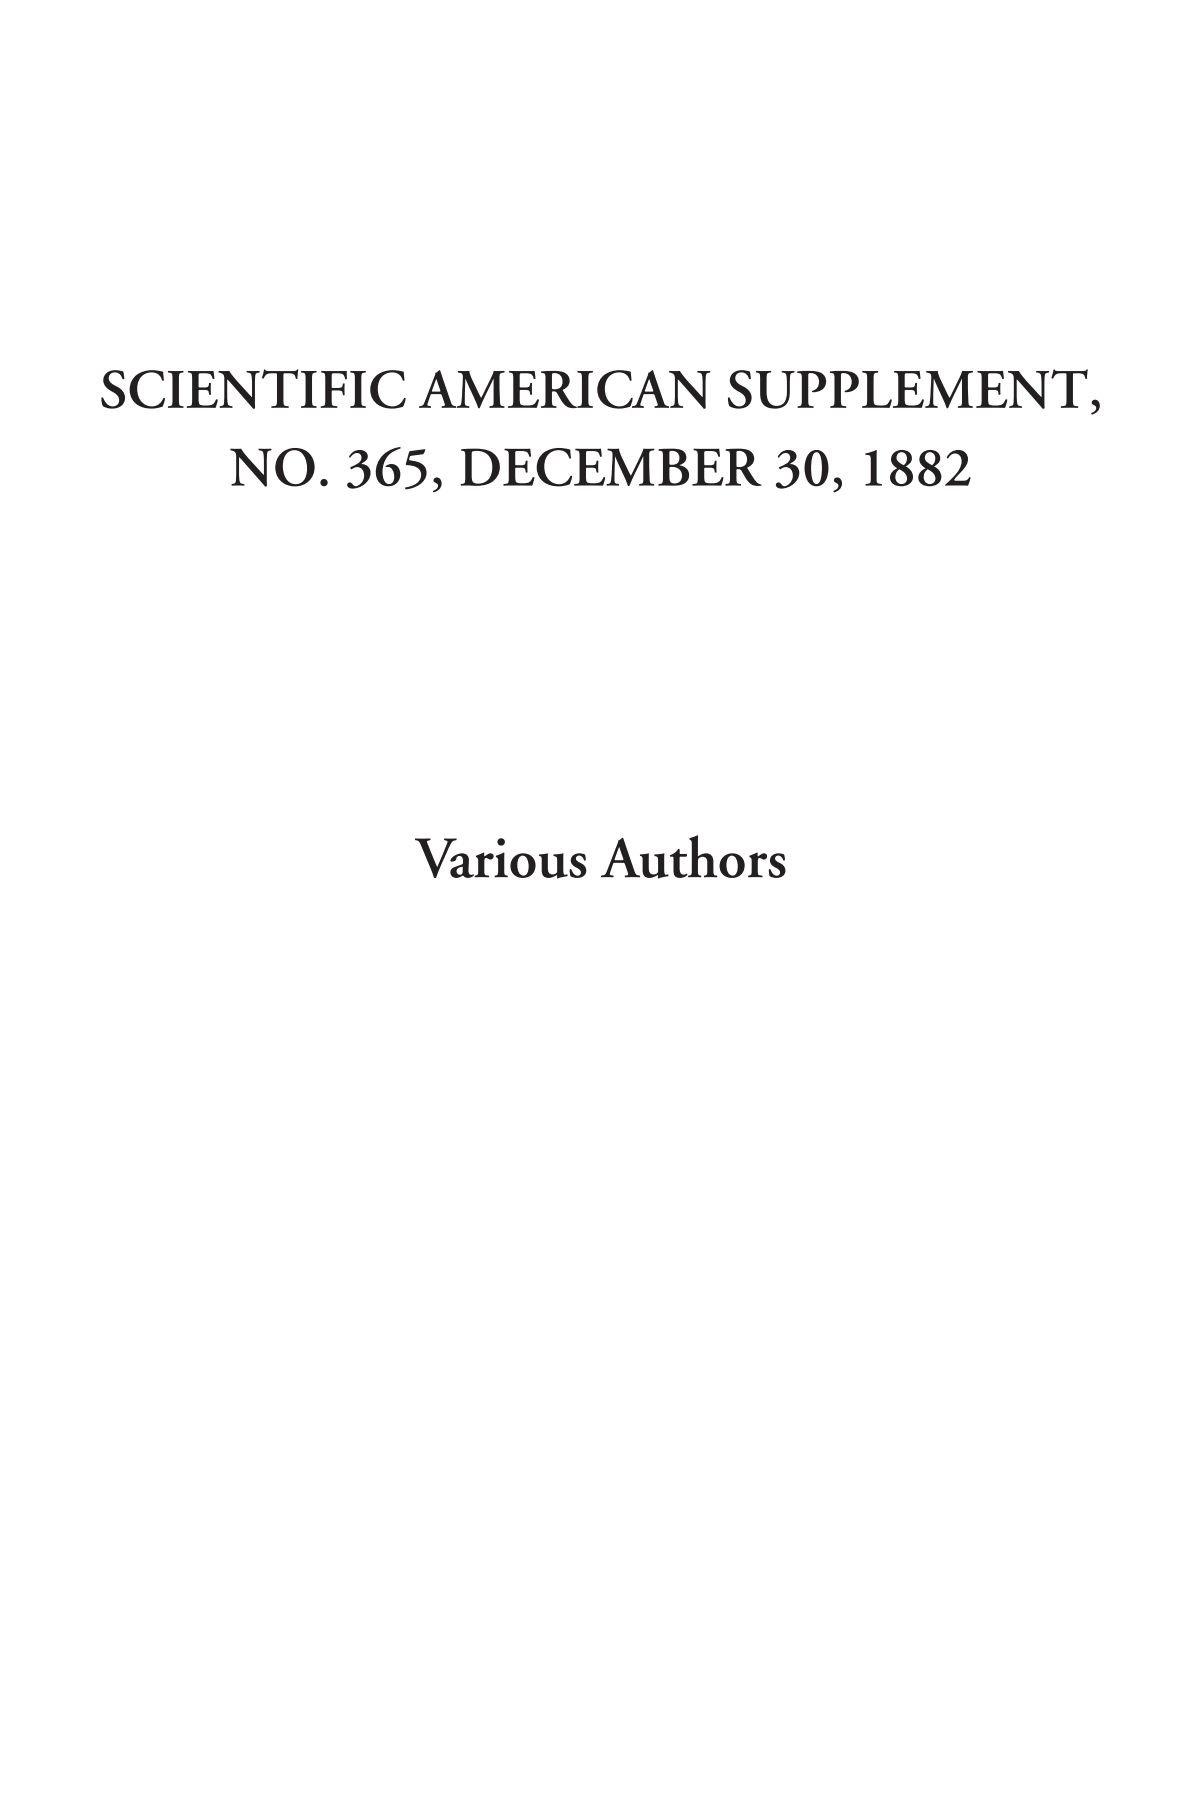 Download Scientific American Supplement, No. 365, December 30, 1882 pdf